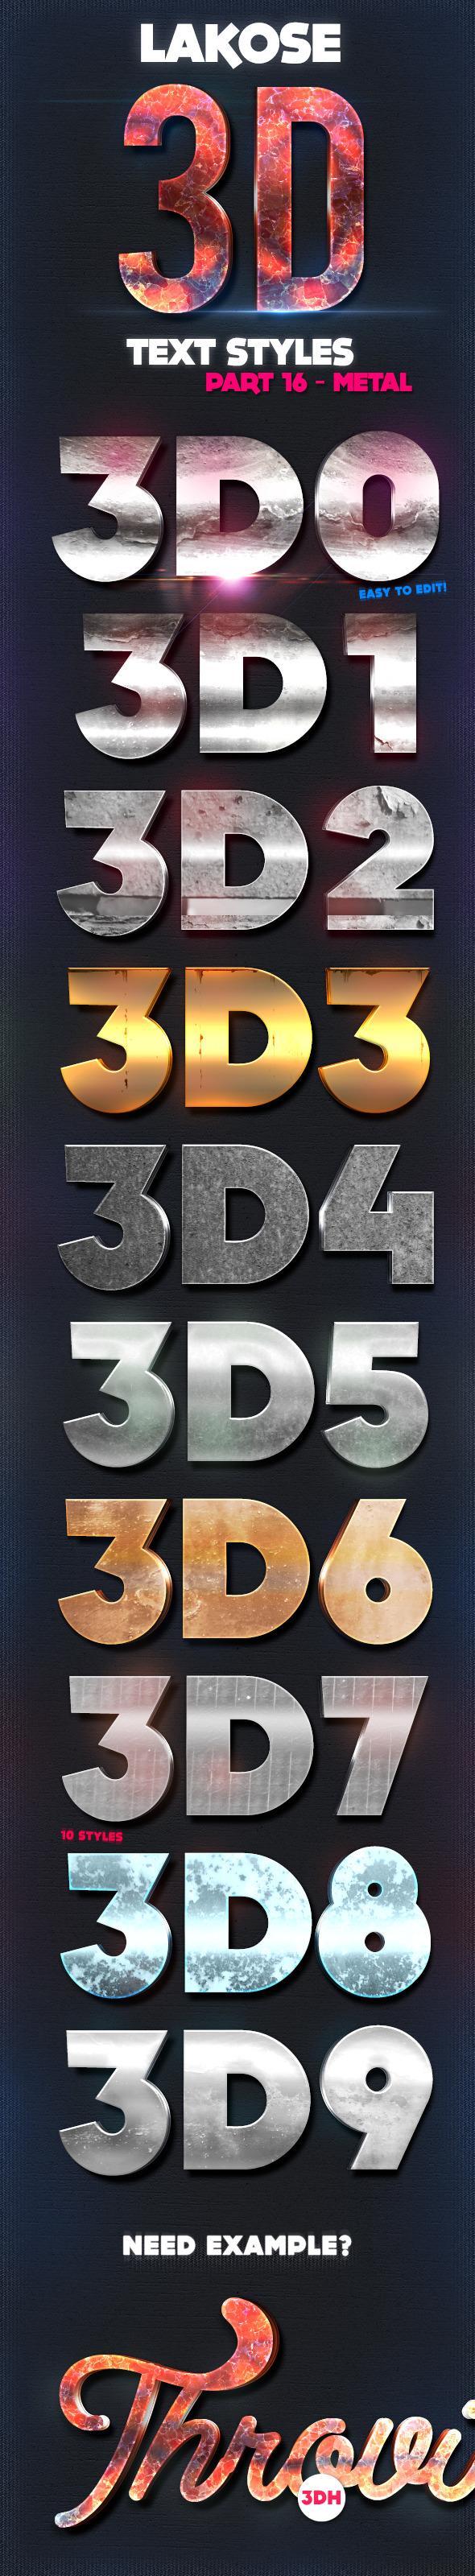 GraphicRiver Lakose 3D Text Styles Part 16 9695871